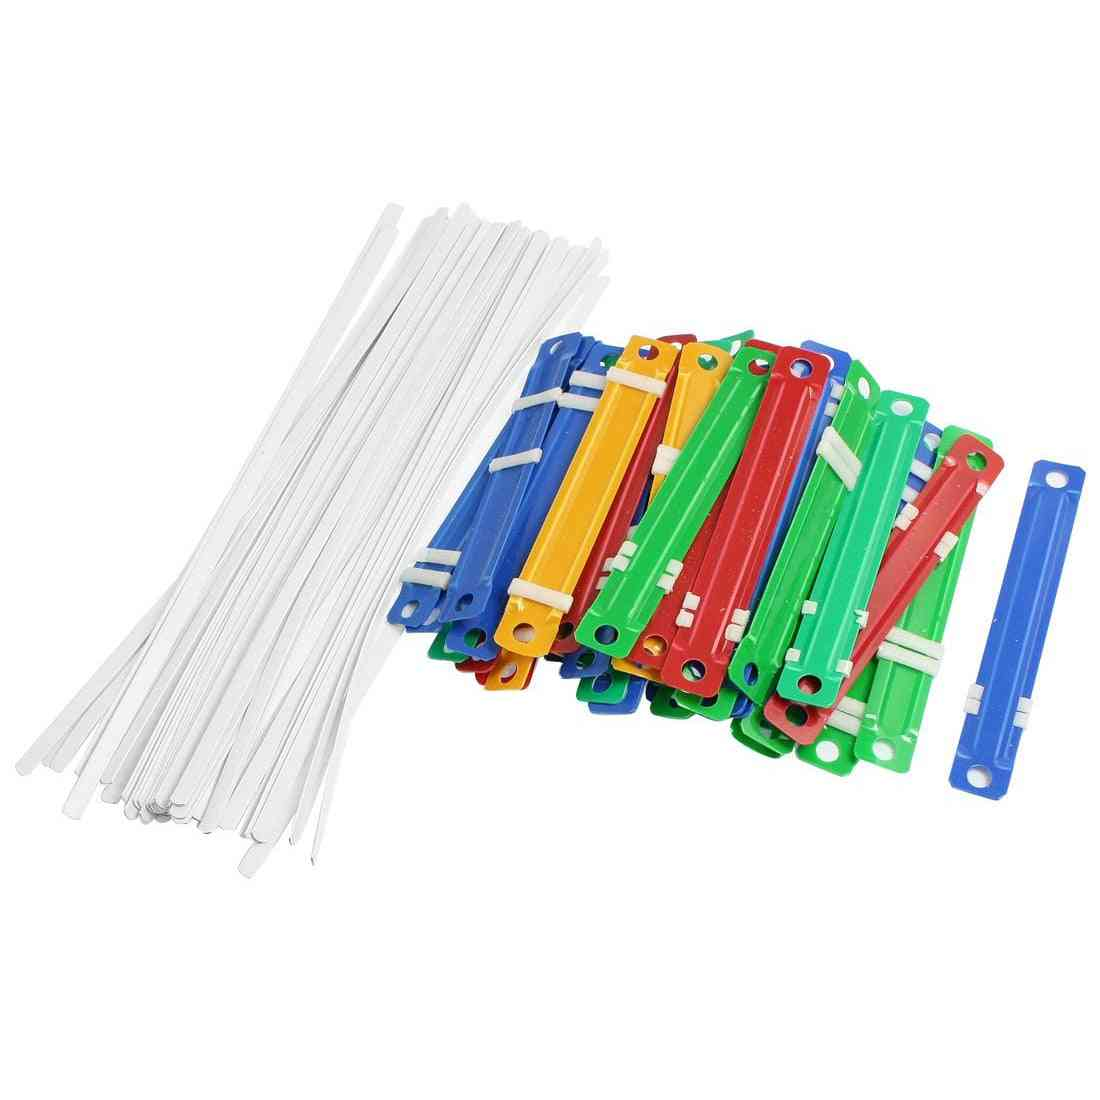 Office & School Plastic Binding, Two-piece Document Paper Fasteners